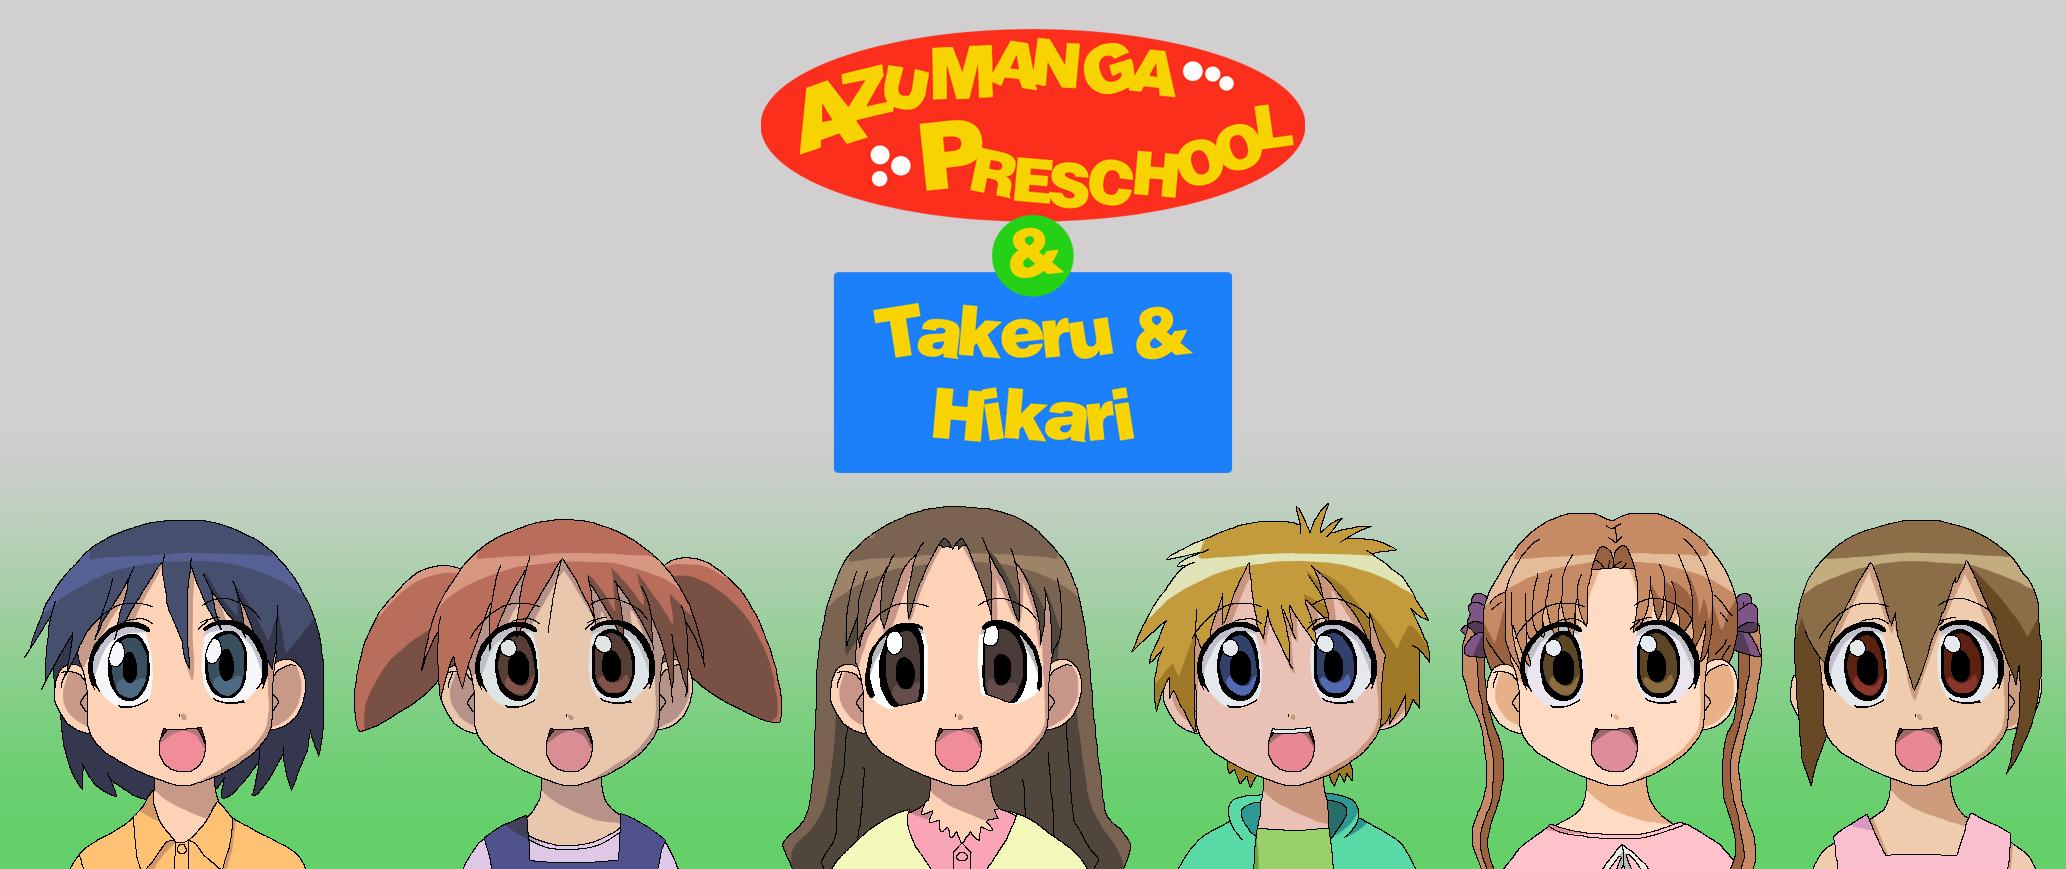 Azumanga Preschool And Takeru & Hikari